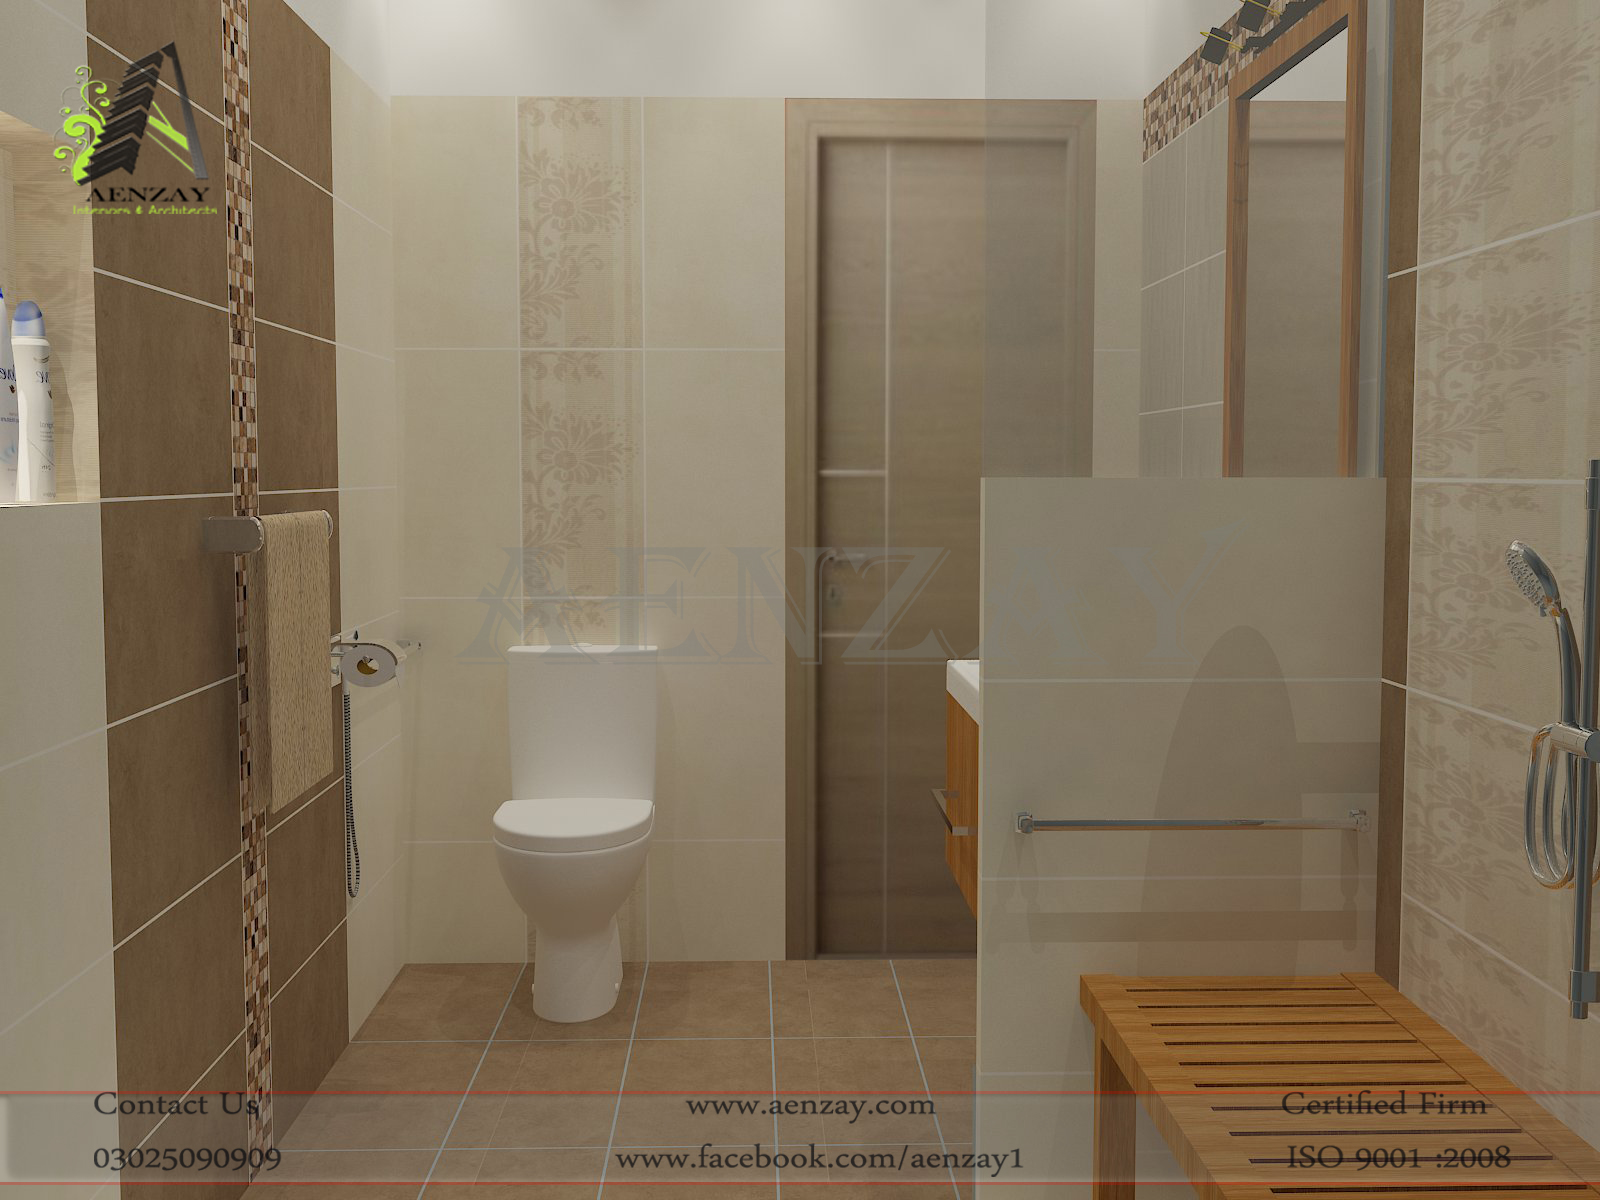 Bathro0m Design by Aenzay I  A  Aenzay Interiors